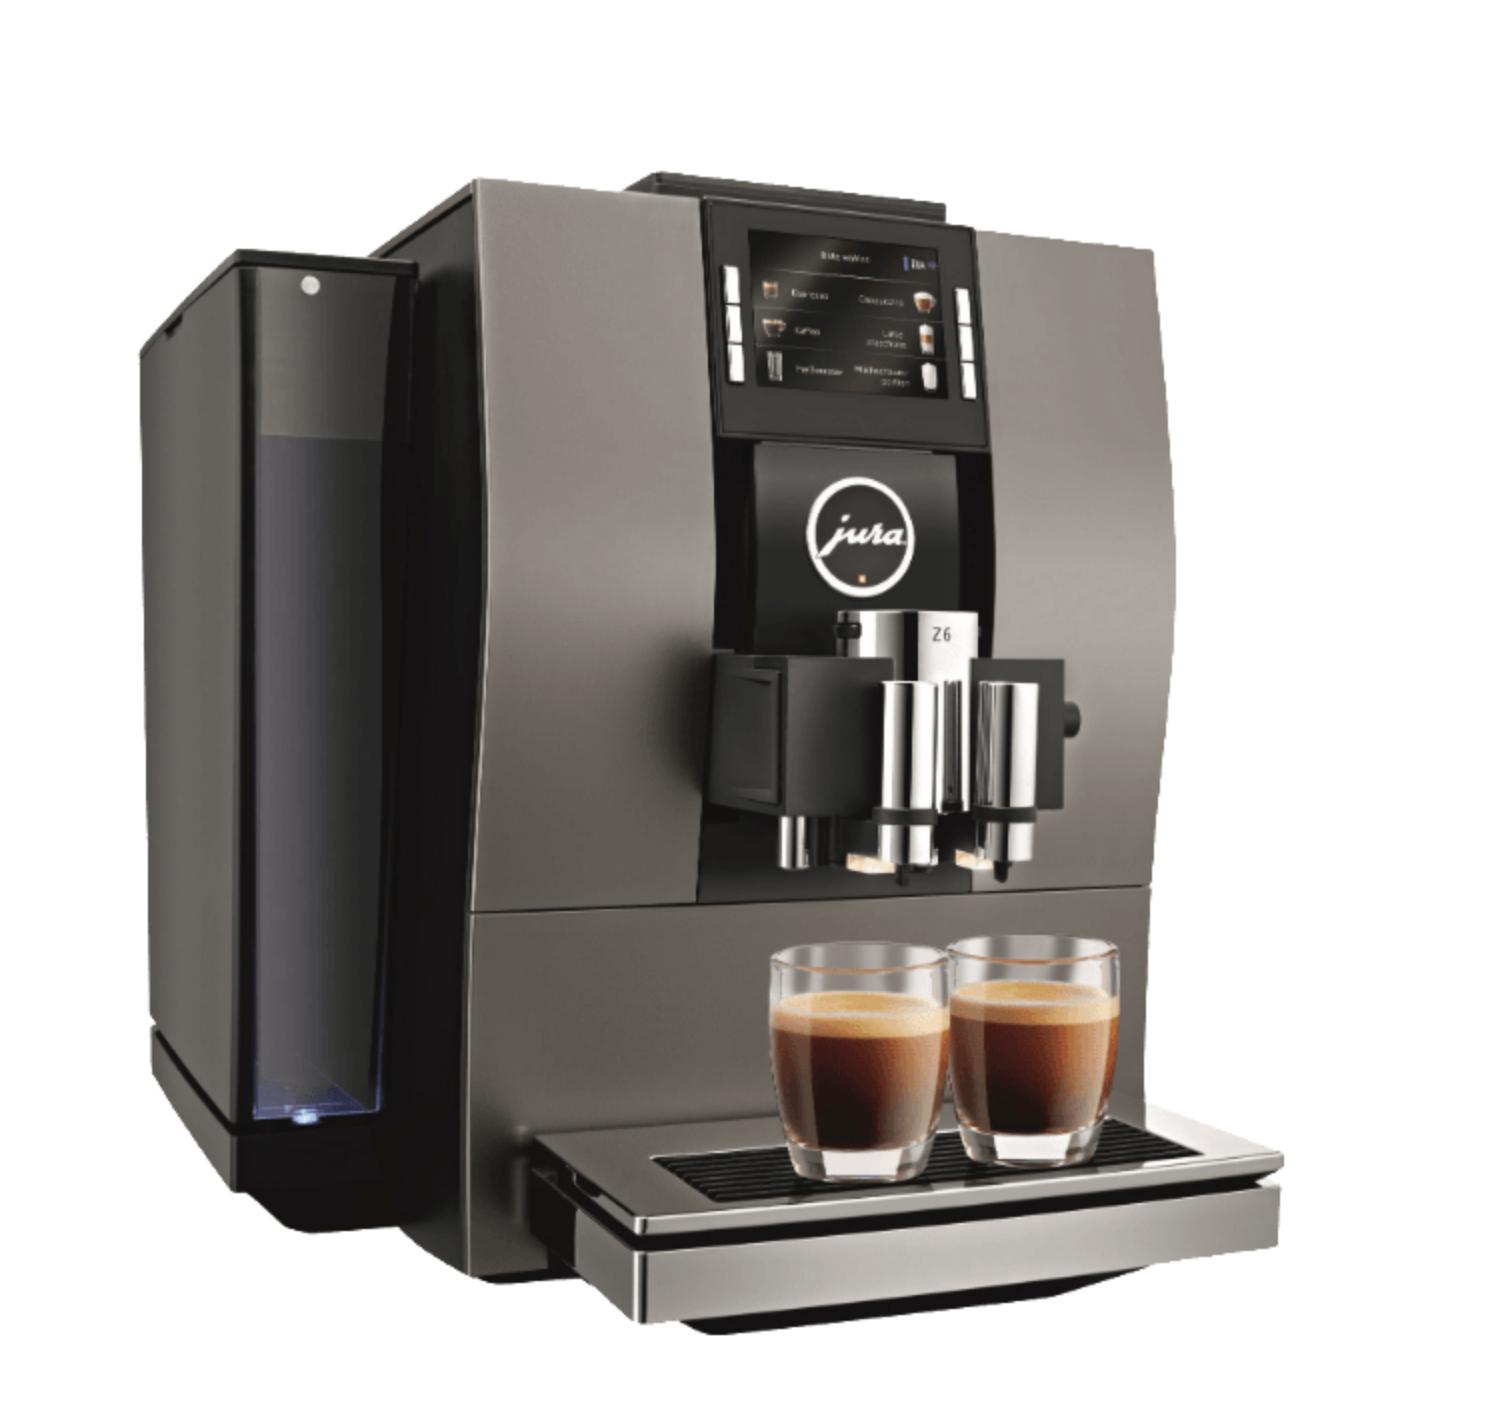 Jura Z6 Kaffeevollautomat schwarz (15 bar, Kegelmahlwerk, App-Steuerung, Farbdisplay) Lokal Nürnberg Fürth